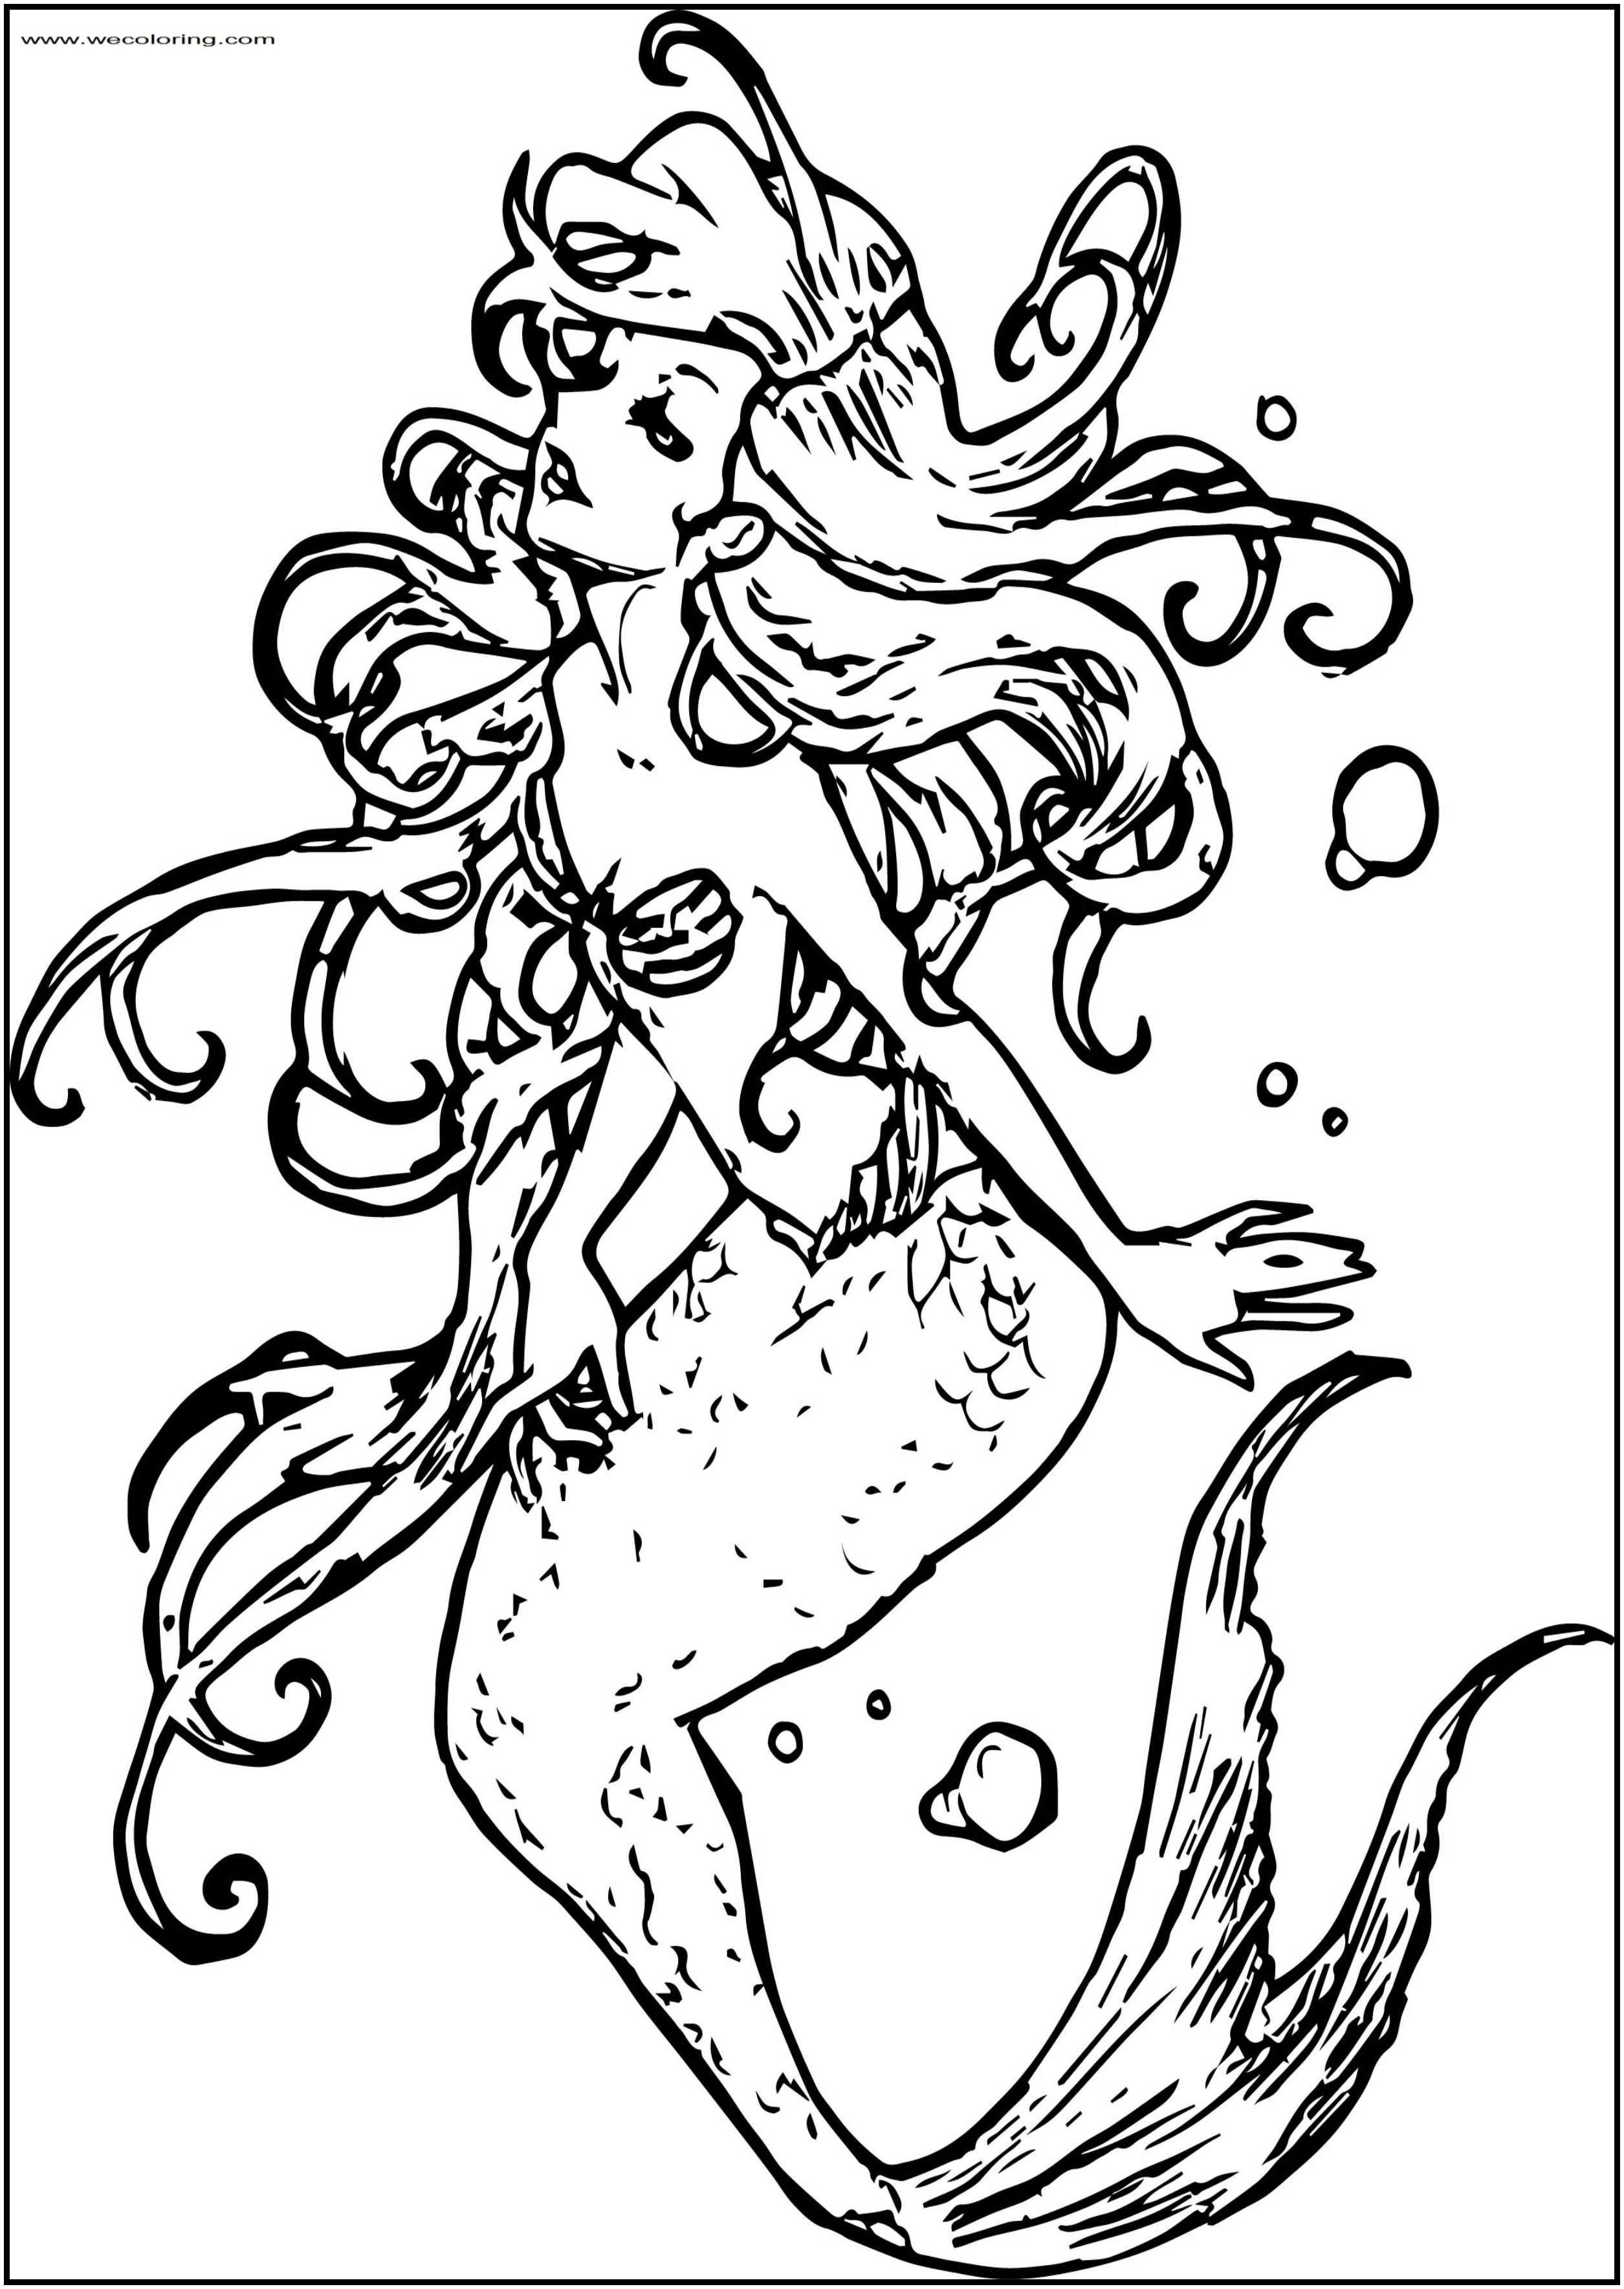 The Ariel Mermaid Free Printable Coloring Page